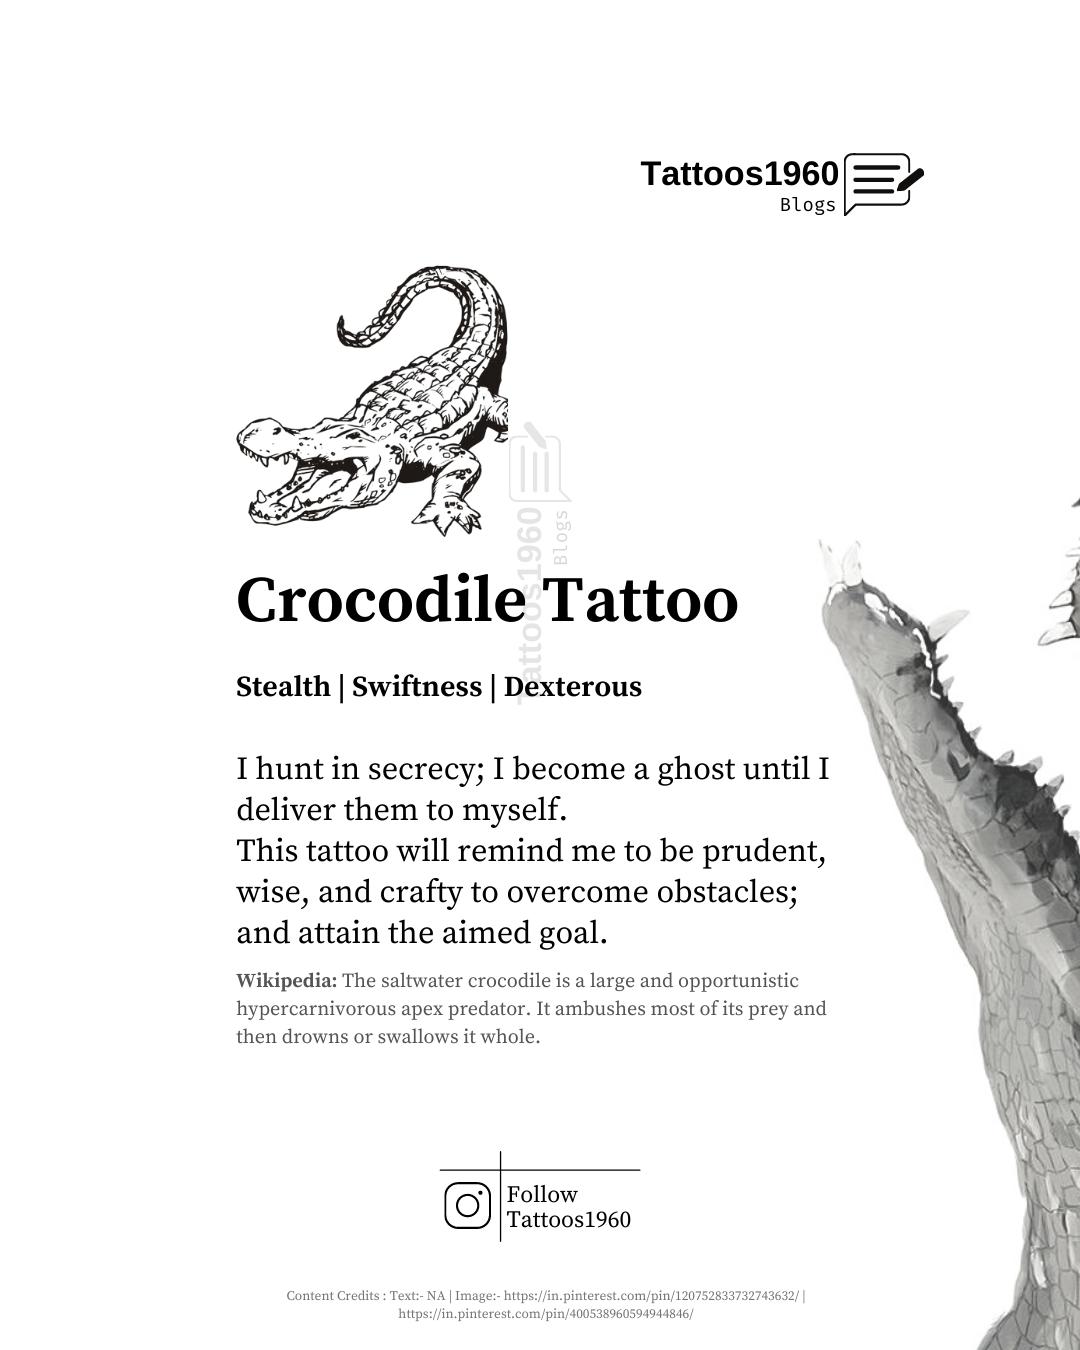 #crocodile #wildlife #alligator #crocodiles #nature #reptile #reptiles #animals #croc #reptilesofinstagram #animal #crocodileleather #leather #art #photography #handmade #fashion #wildlifephotography #crocodilesofinstagram #crocs #crocodilehunter #love #naturephotography #wild #caiman #adidas #australia #travel #onepiece #tattoomeaning